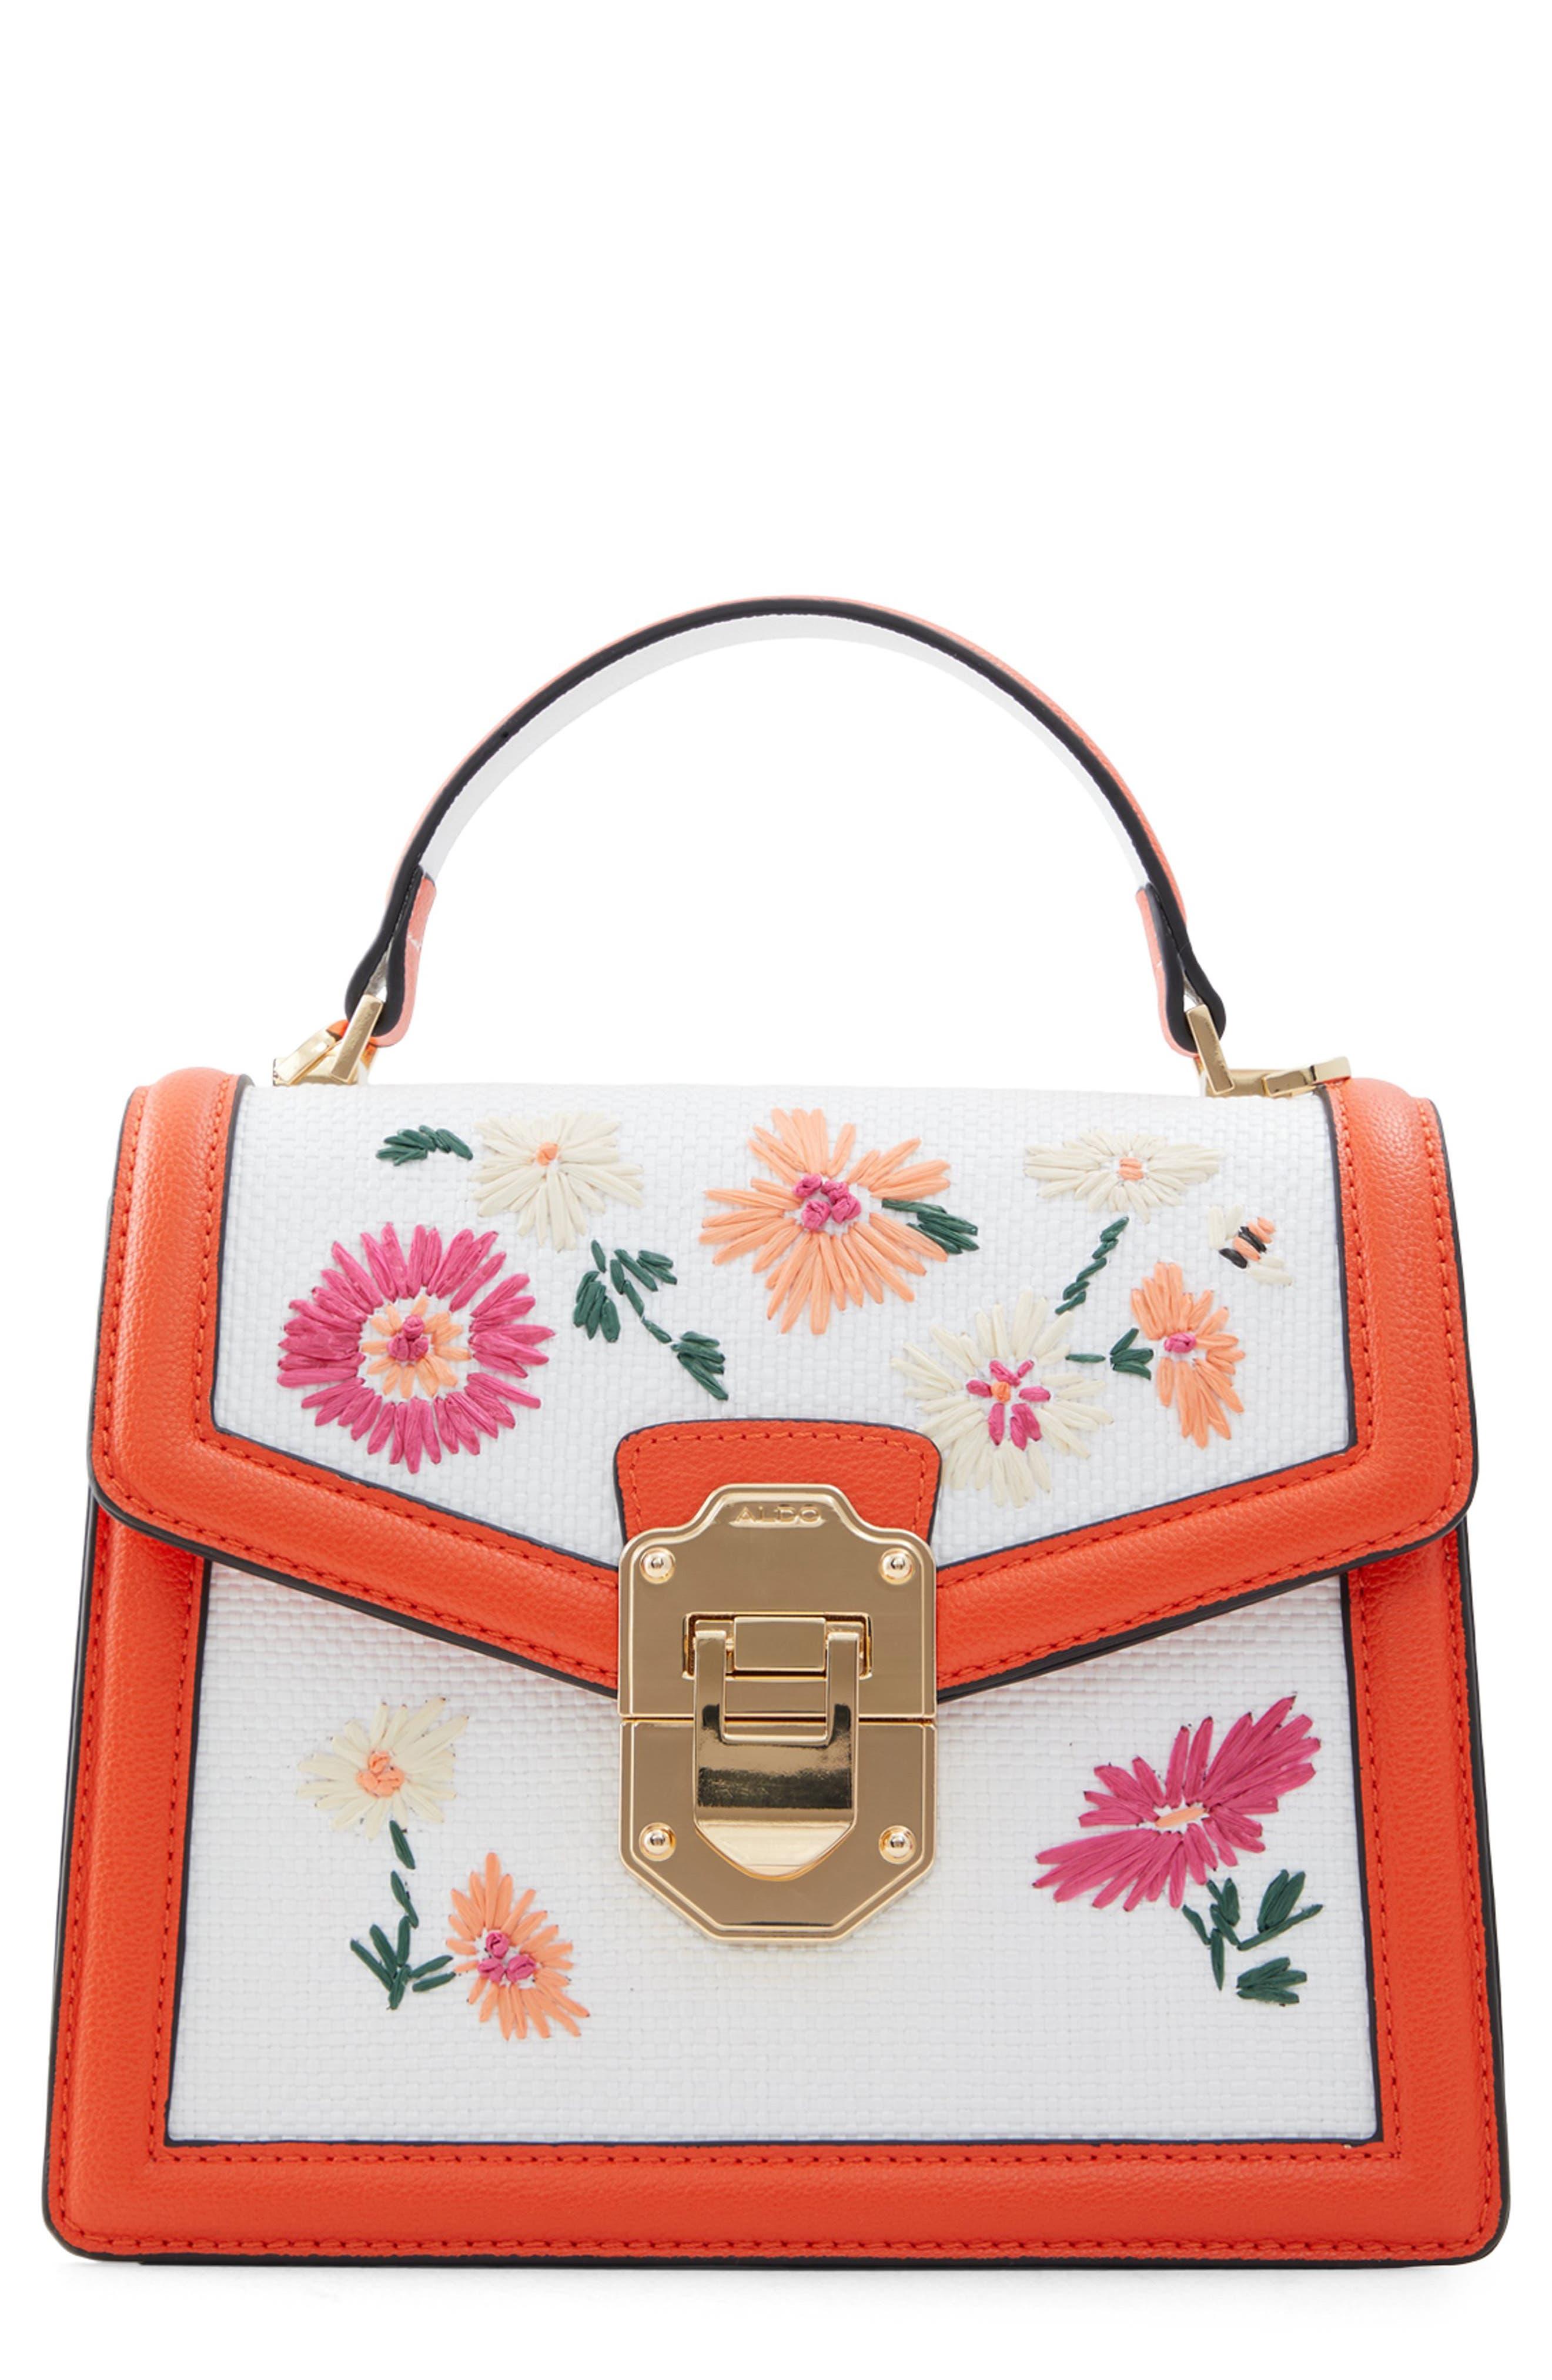 Adryniel Woven Floral Handbag